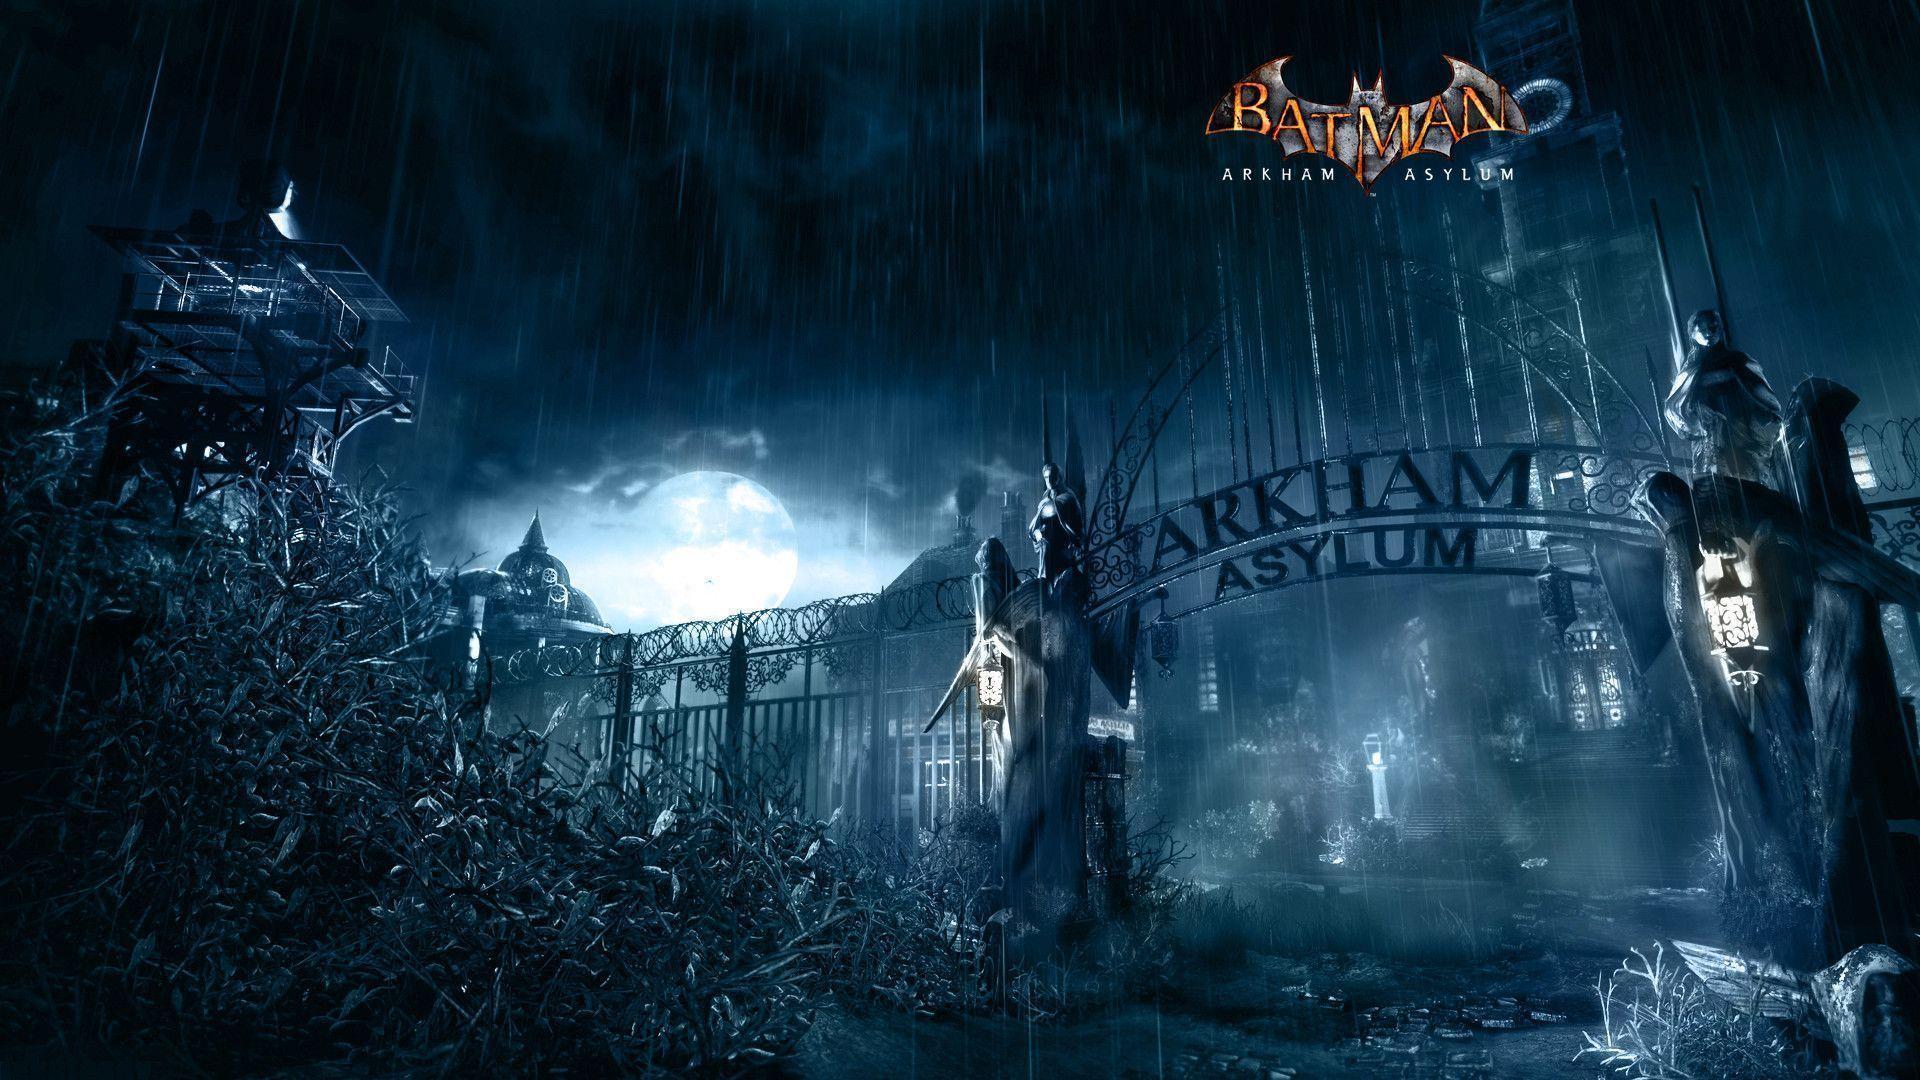 Batman Arkham Asylum Wallpapers - Wallpaper Cave